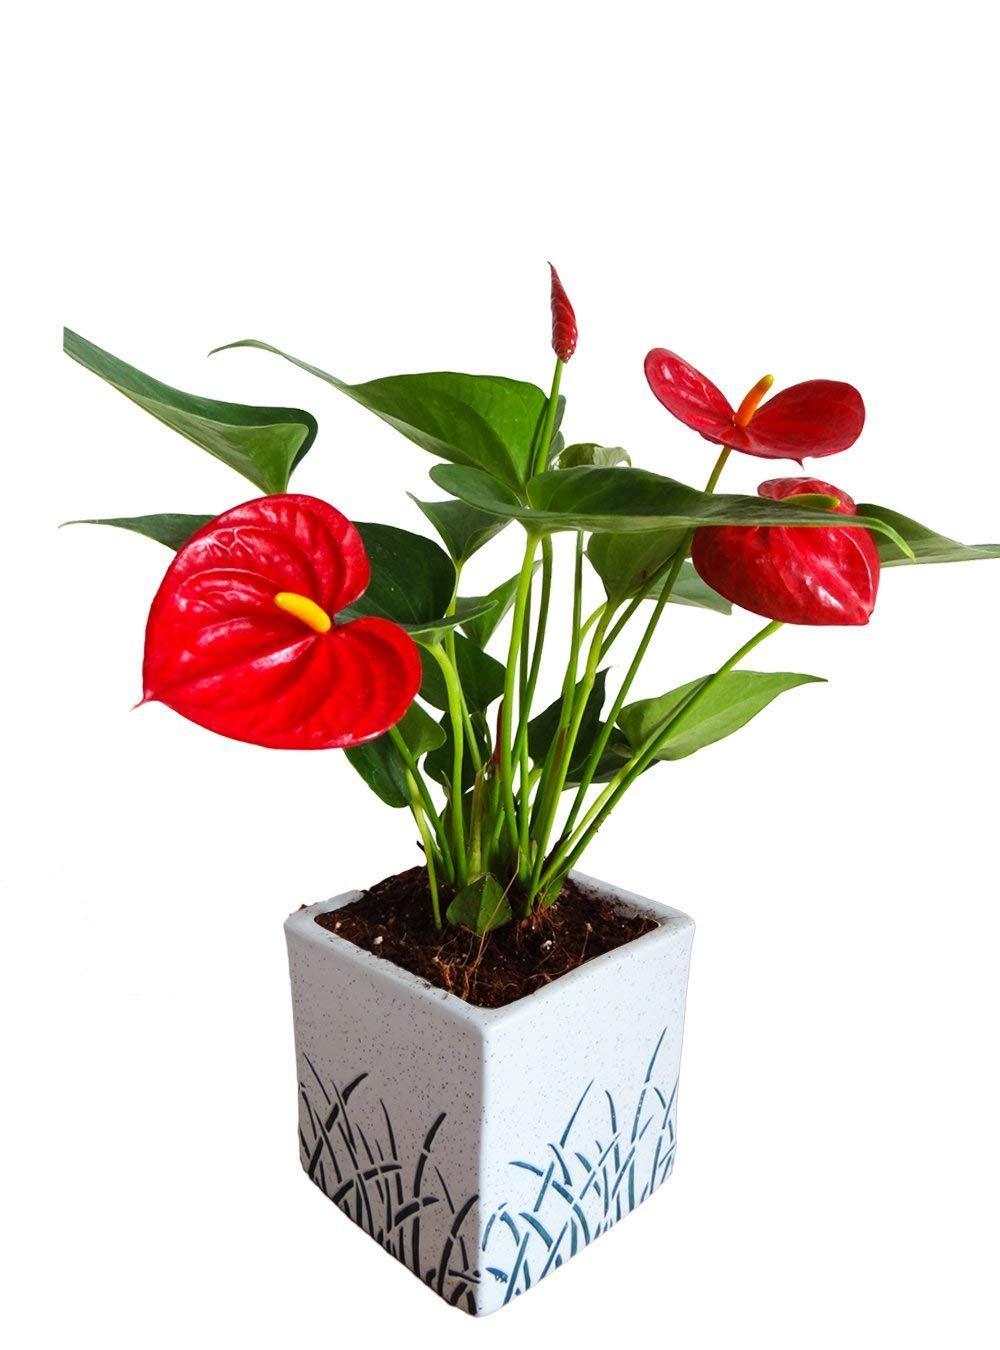 Rolling Nature Air Purifying Red Anthurium Plant In White Cube Aroez Ceramic Pot In 2020 Anthurium Plant Anthurium Plants